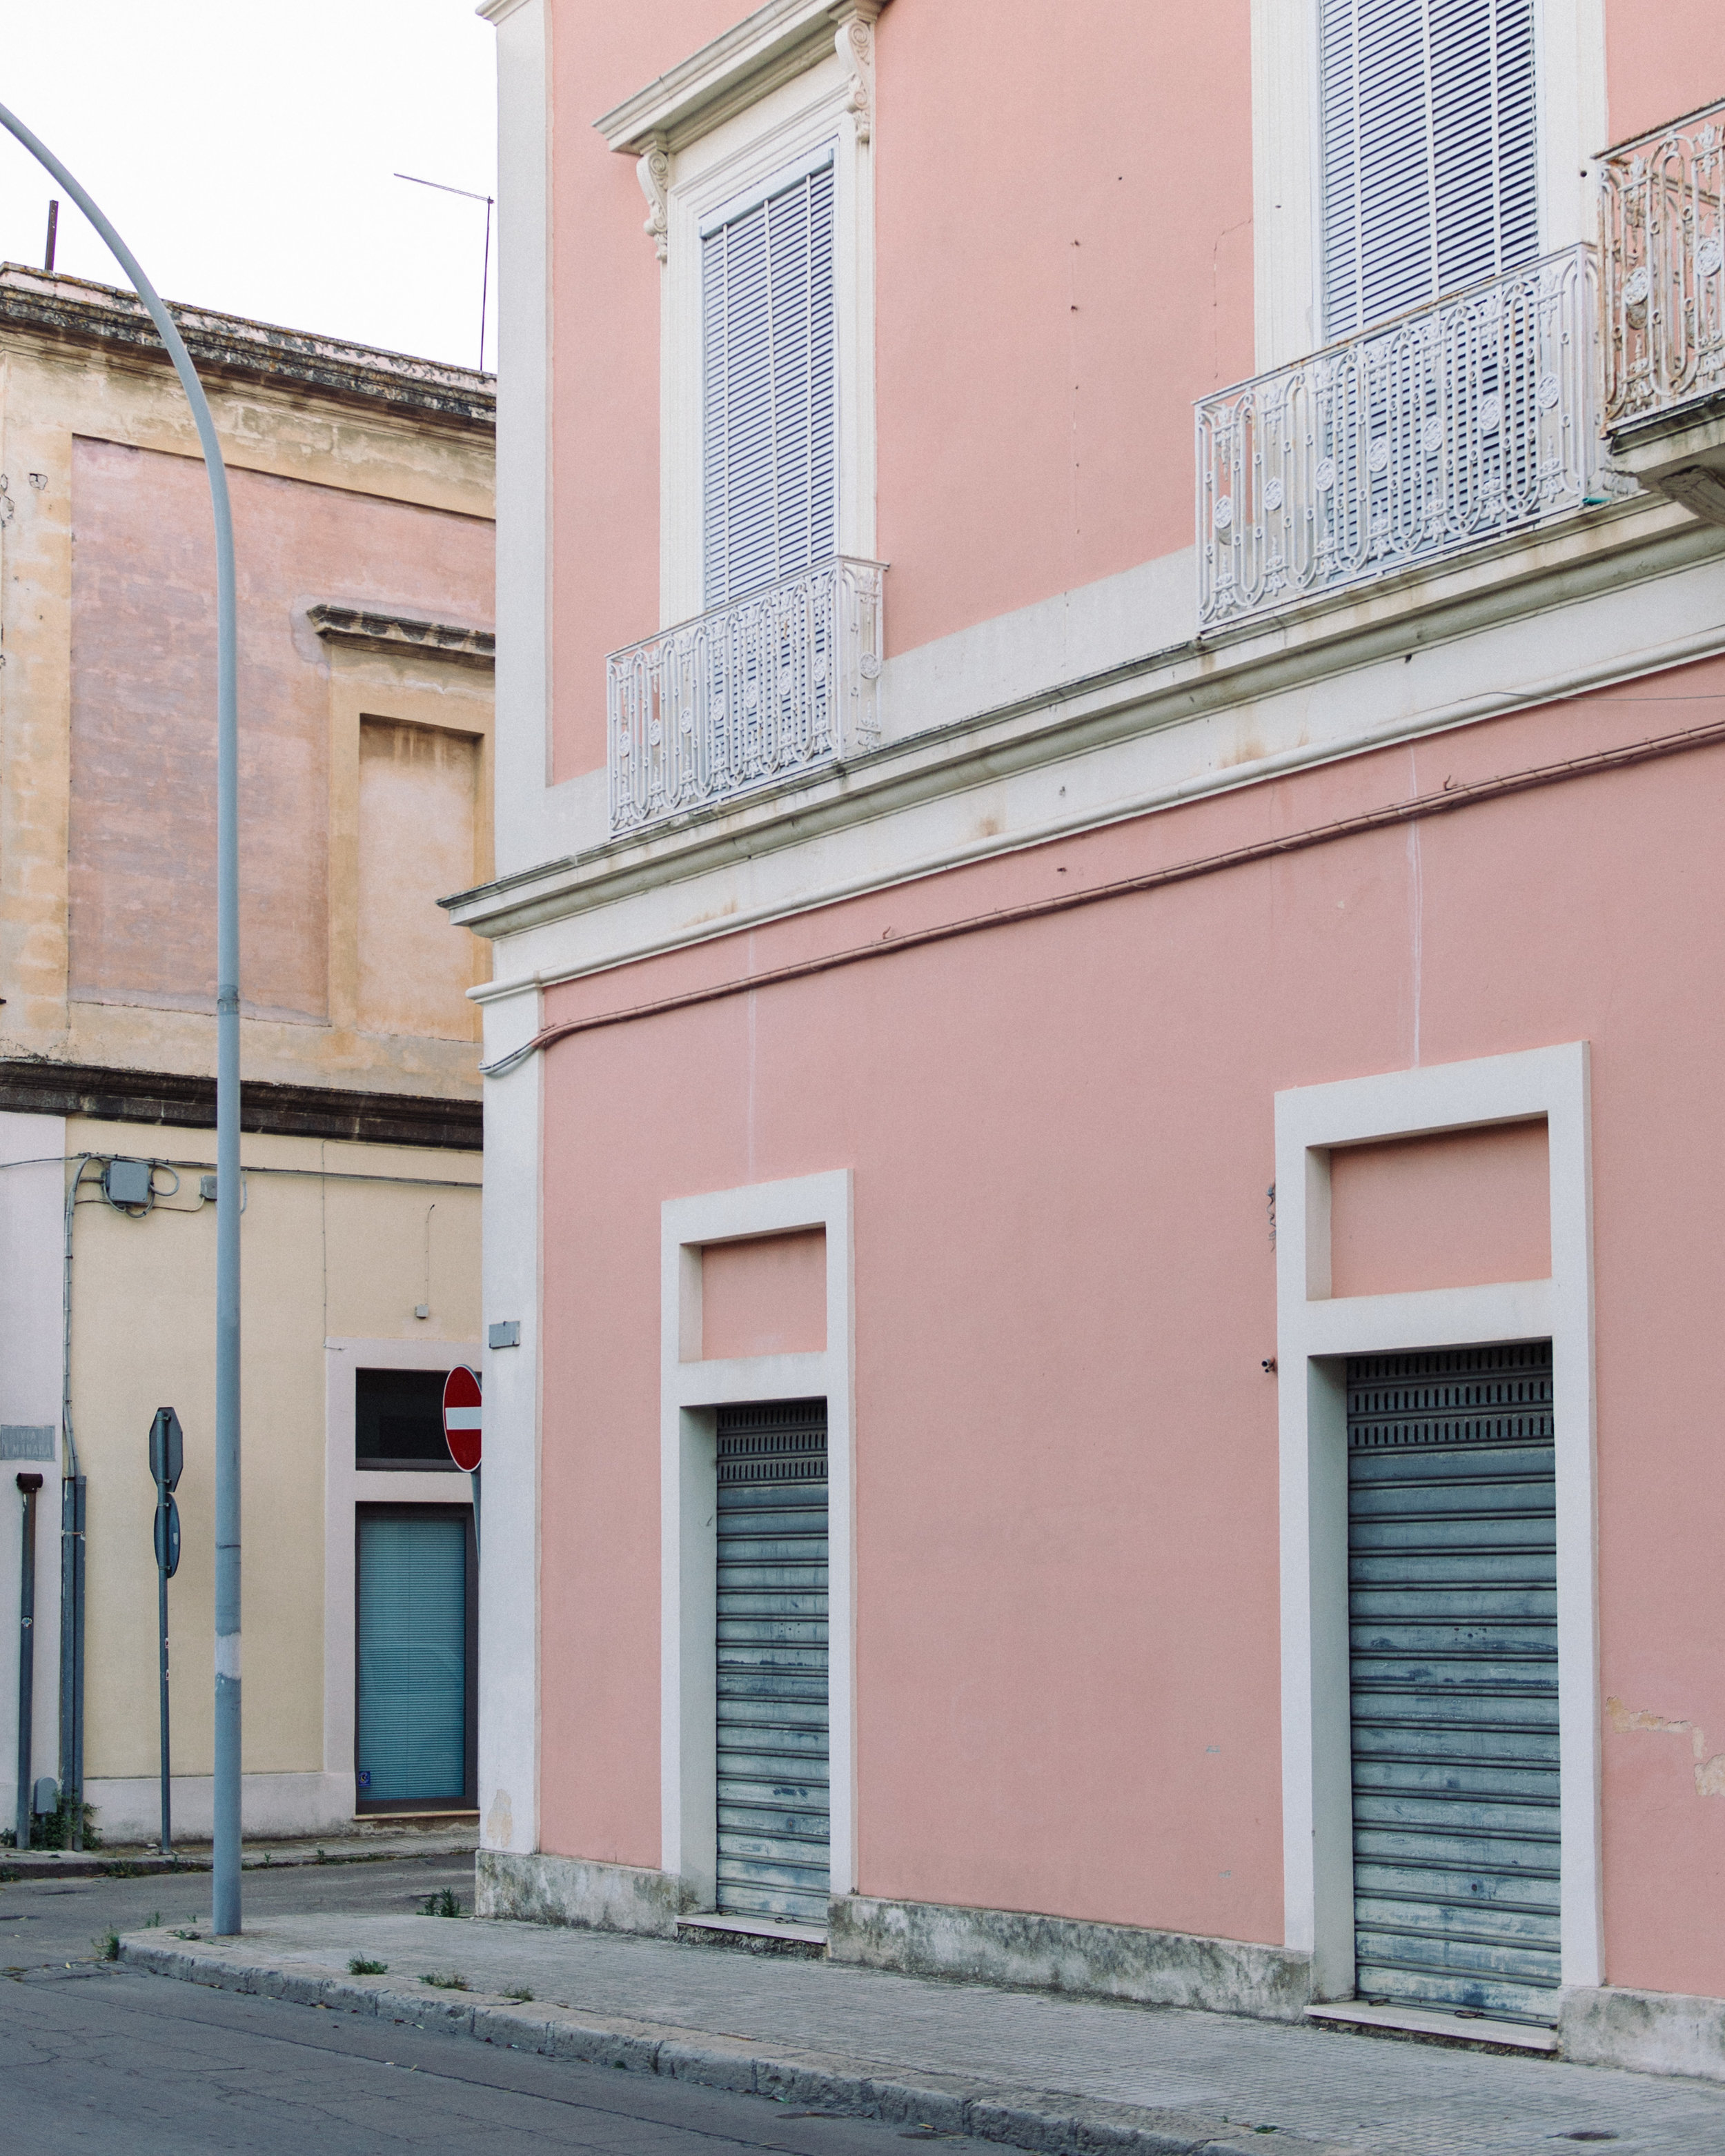 CarleyRudd_Italy(1of1)-9.jpg